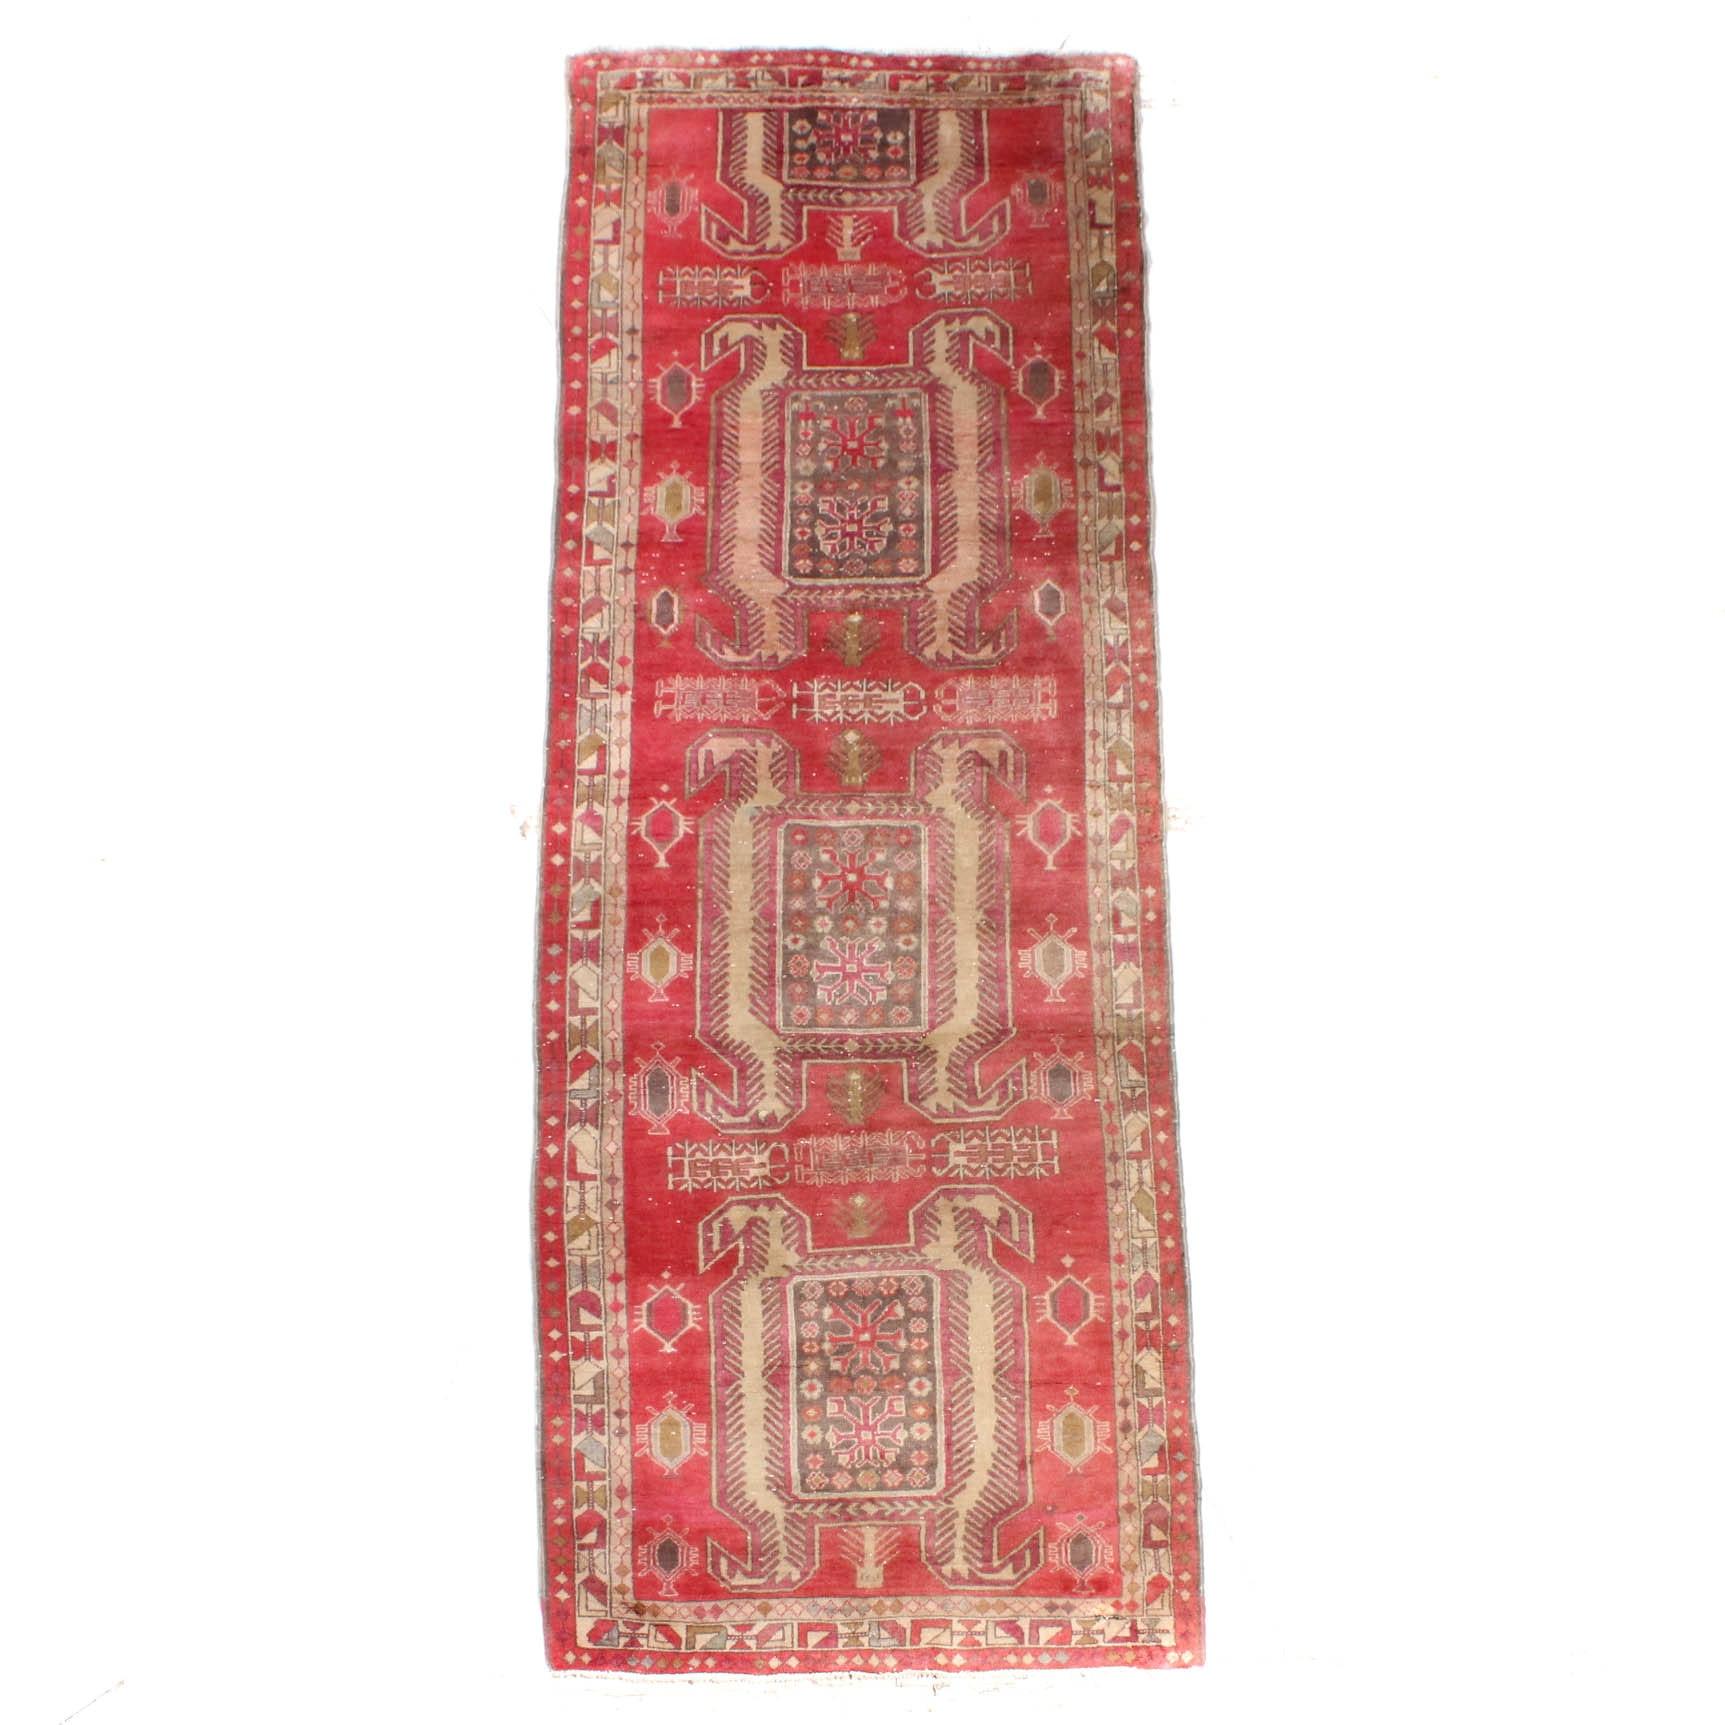 Vintage Hand-Knotted Persian Heriz Rug Runner